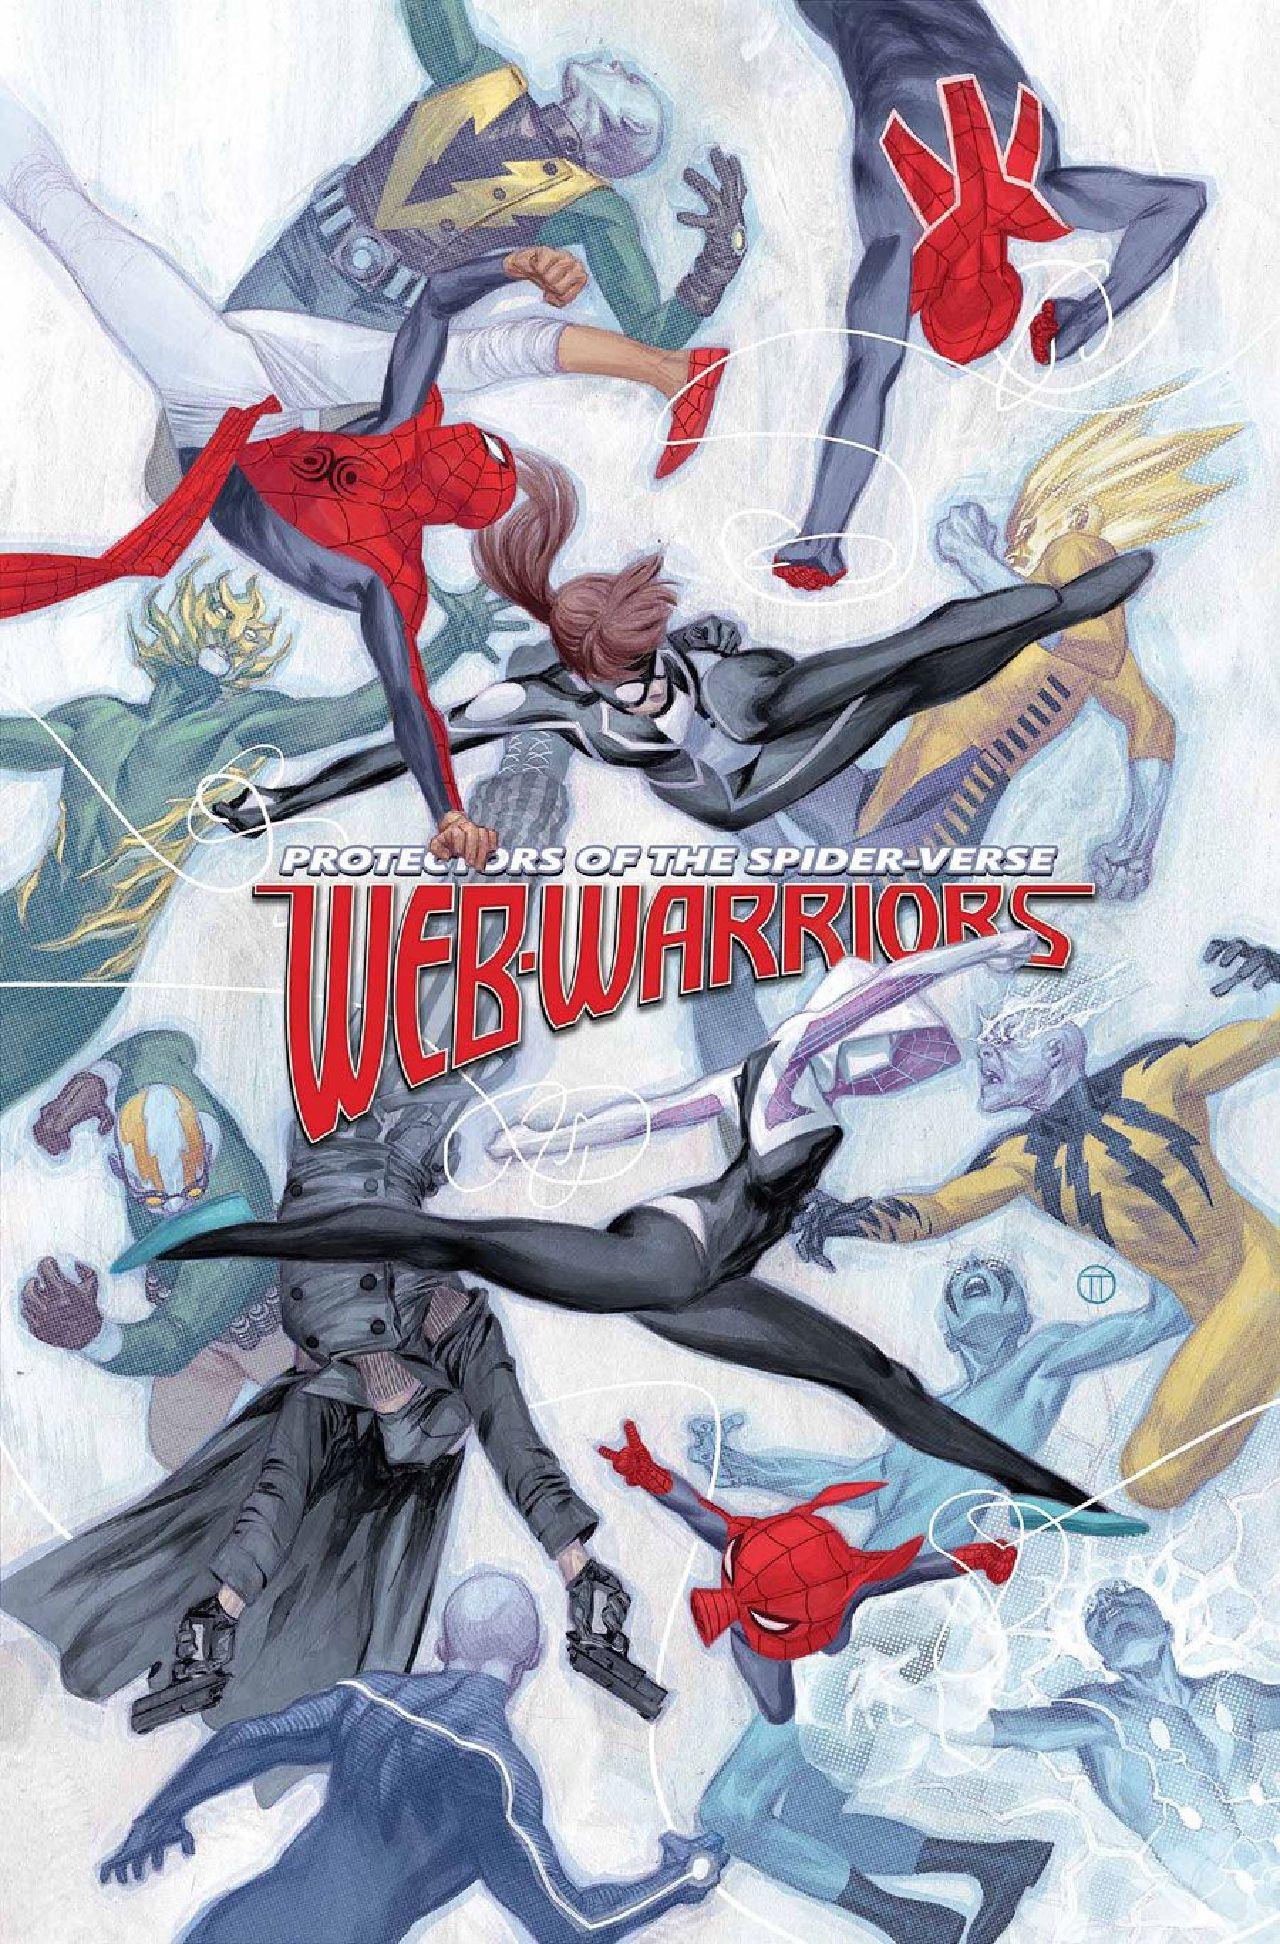 villanos de spiderman web warriors marve studios